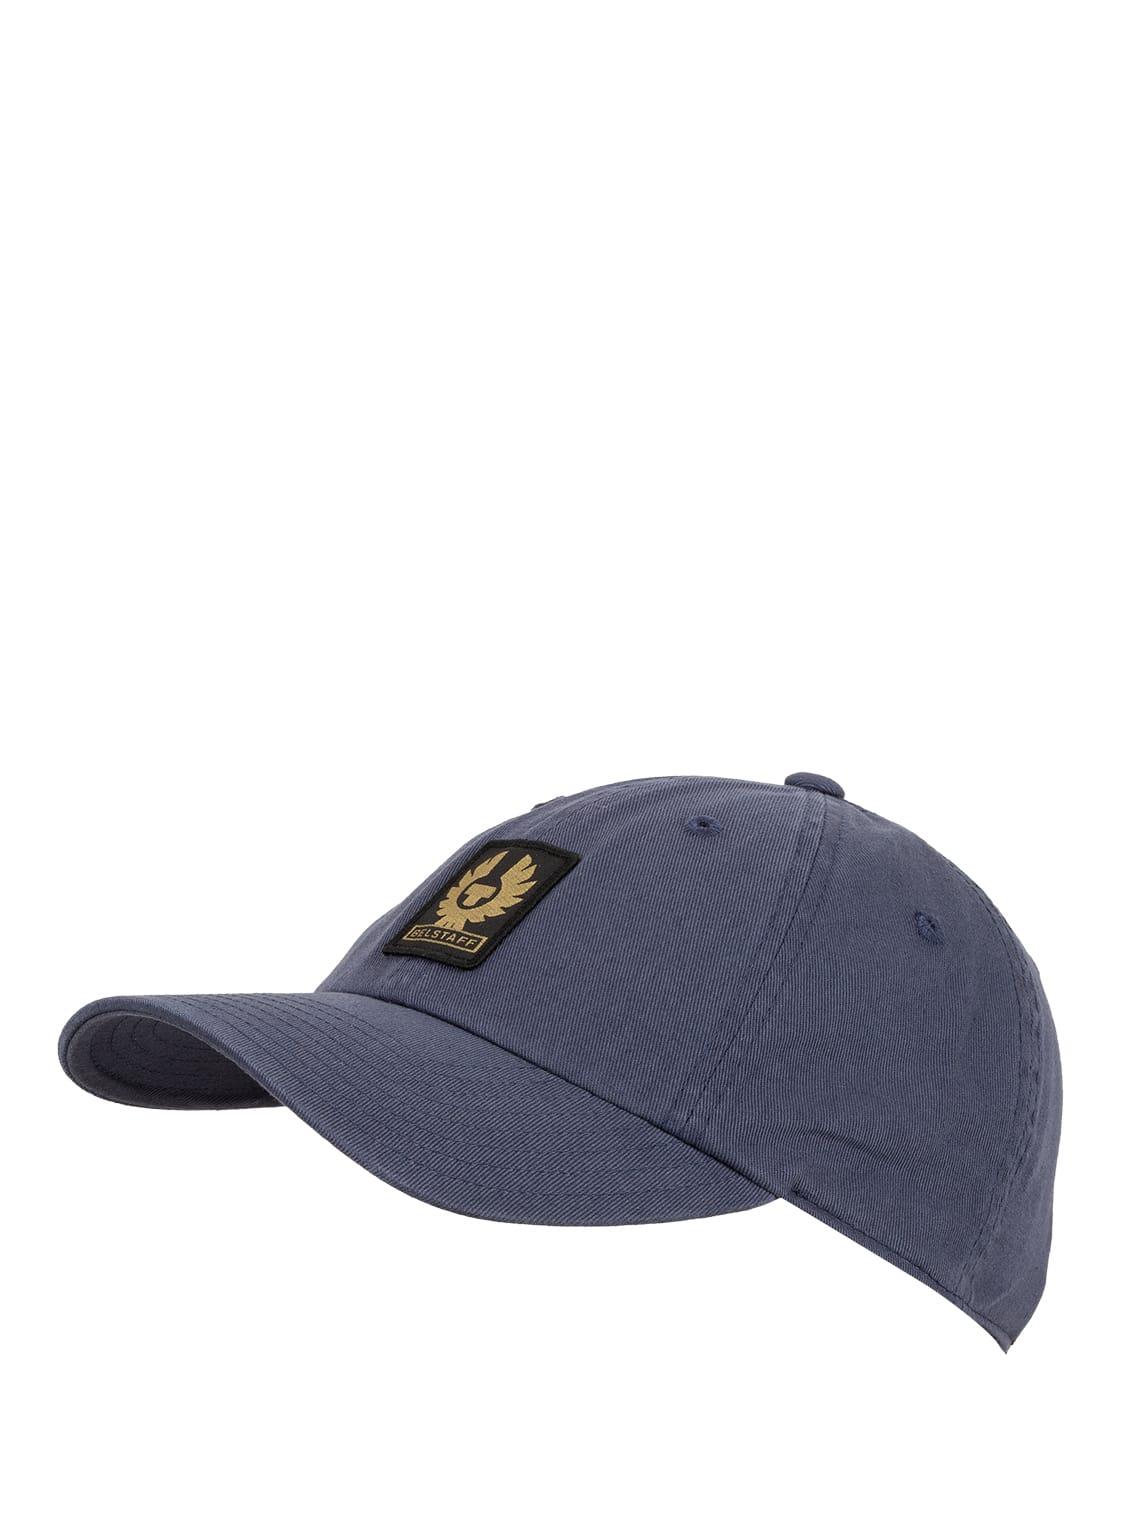 Image of Belstaff Cap blau